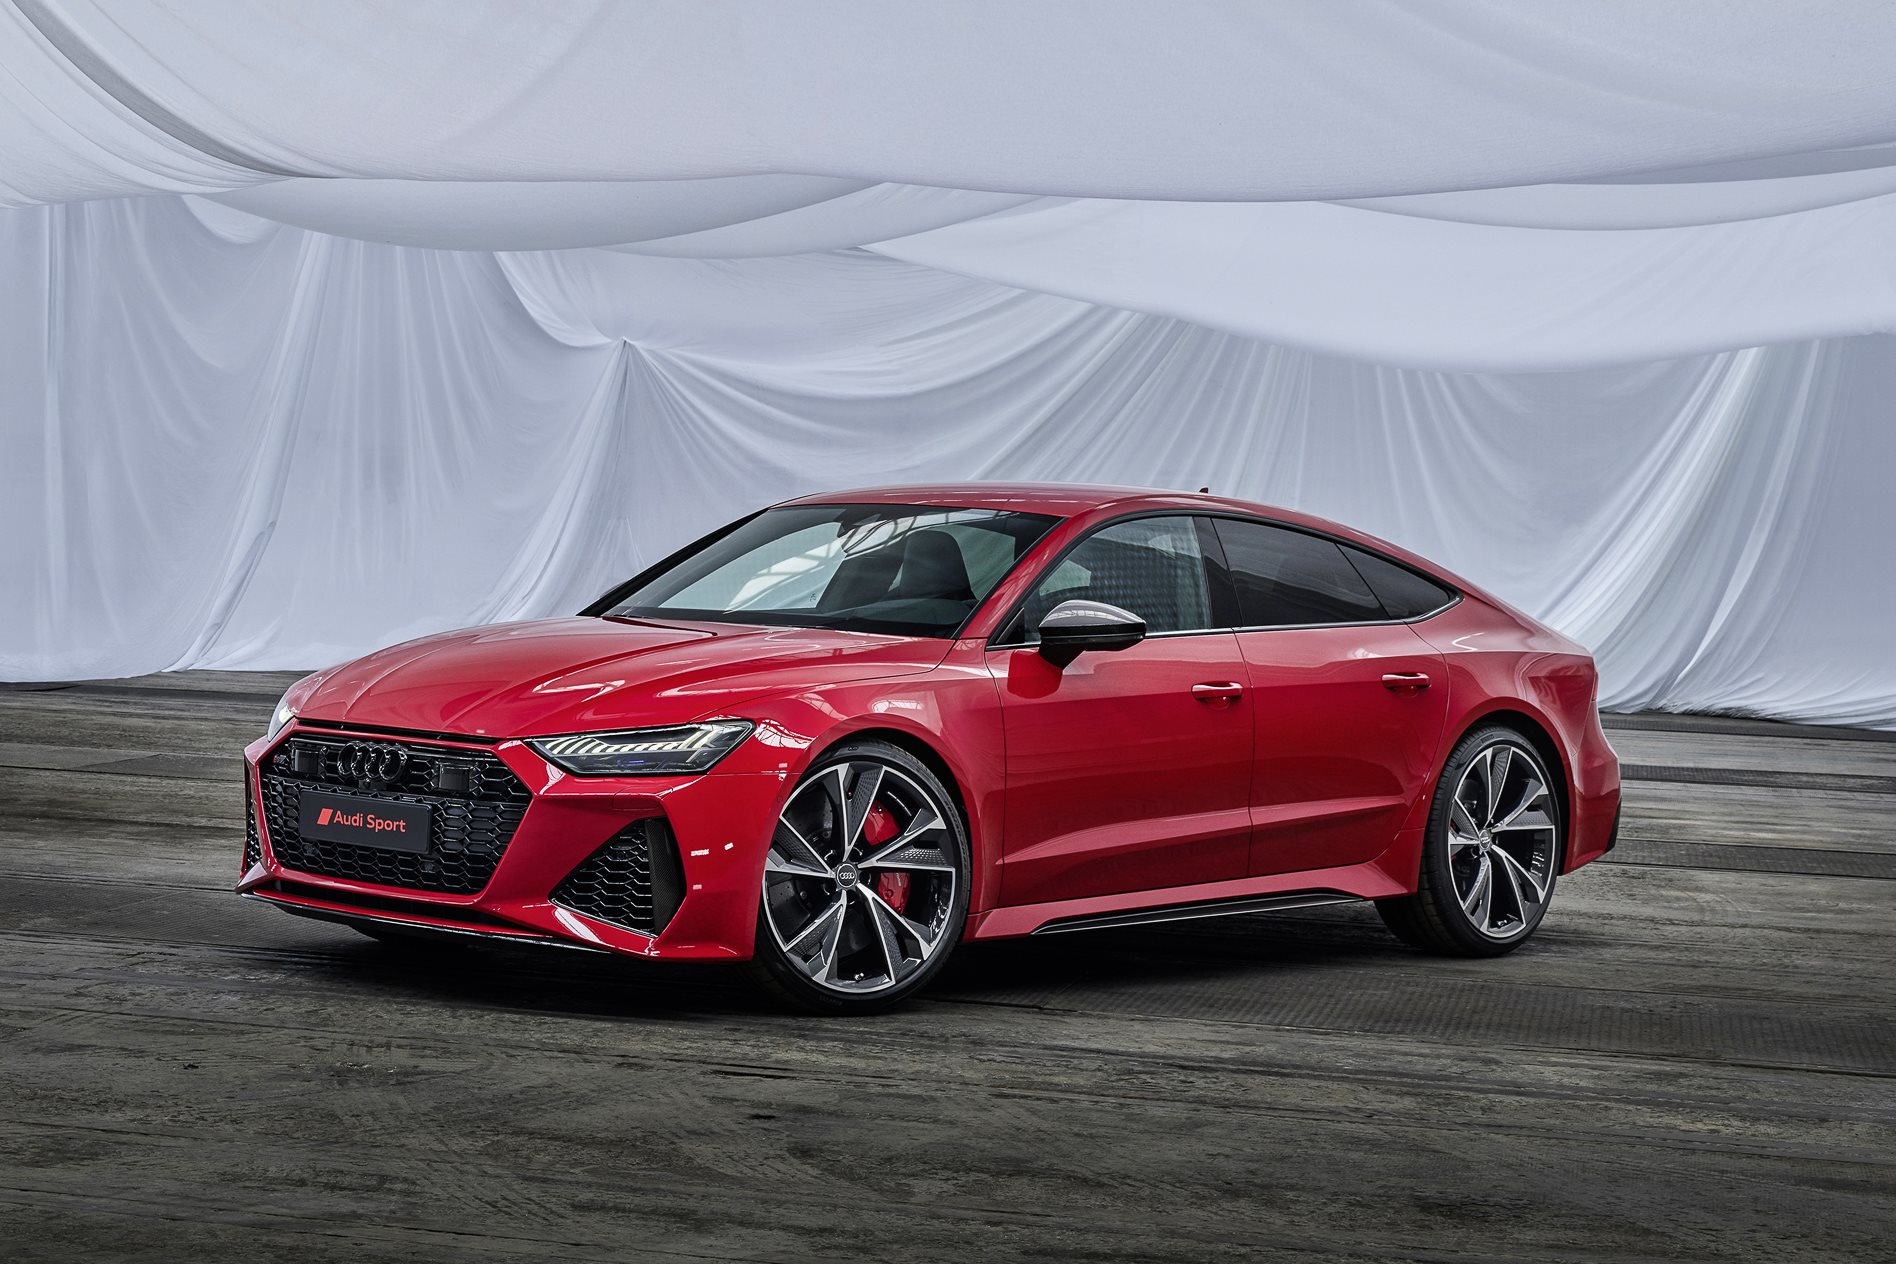 2020 Audi Rs7 Sportback Revealed